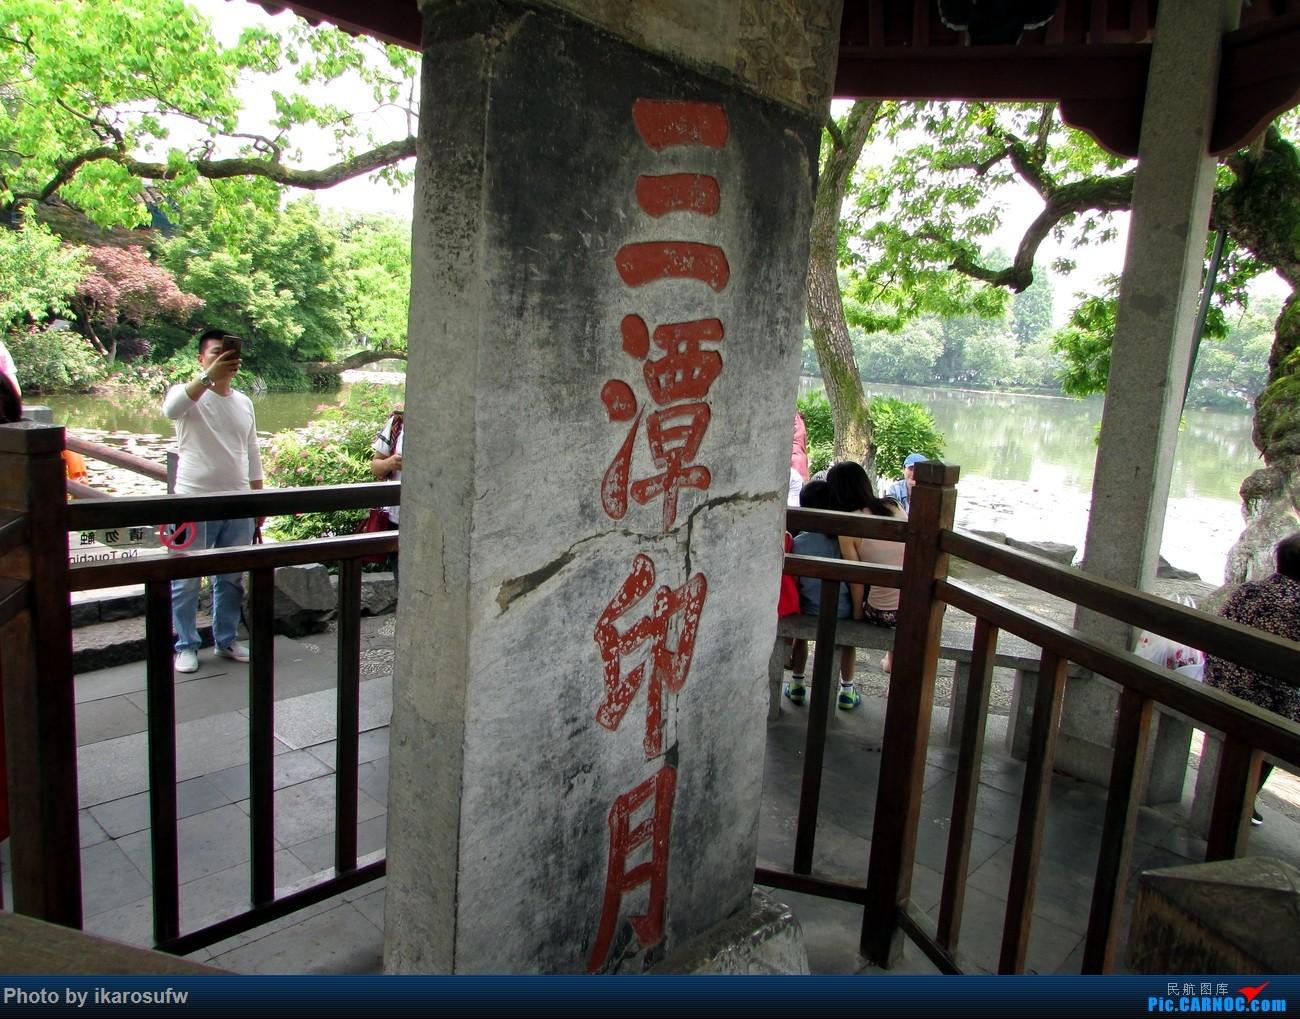 Re:[原创]再次SCOOT新加坡酷航 已经11年没有去杭州西湖走一走了 TR188/189 机型788 789(下)